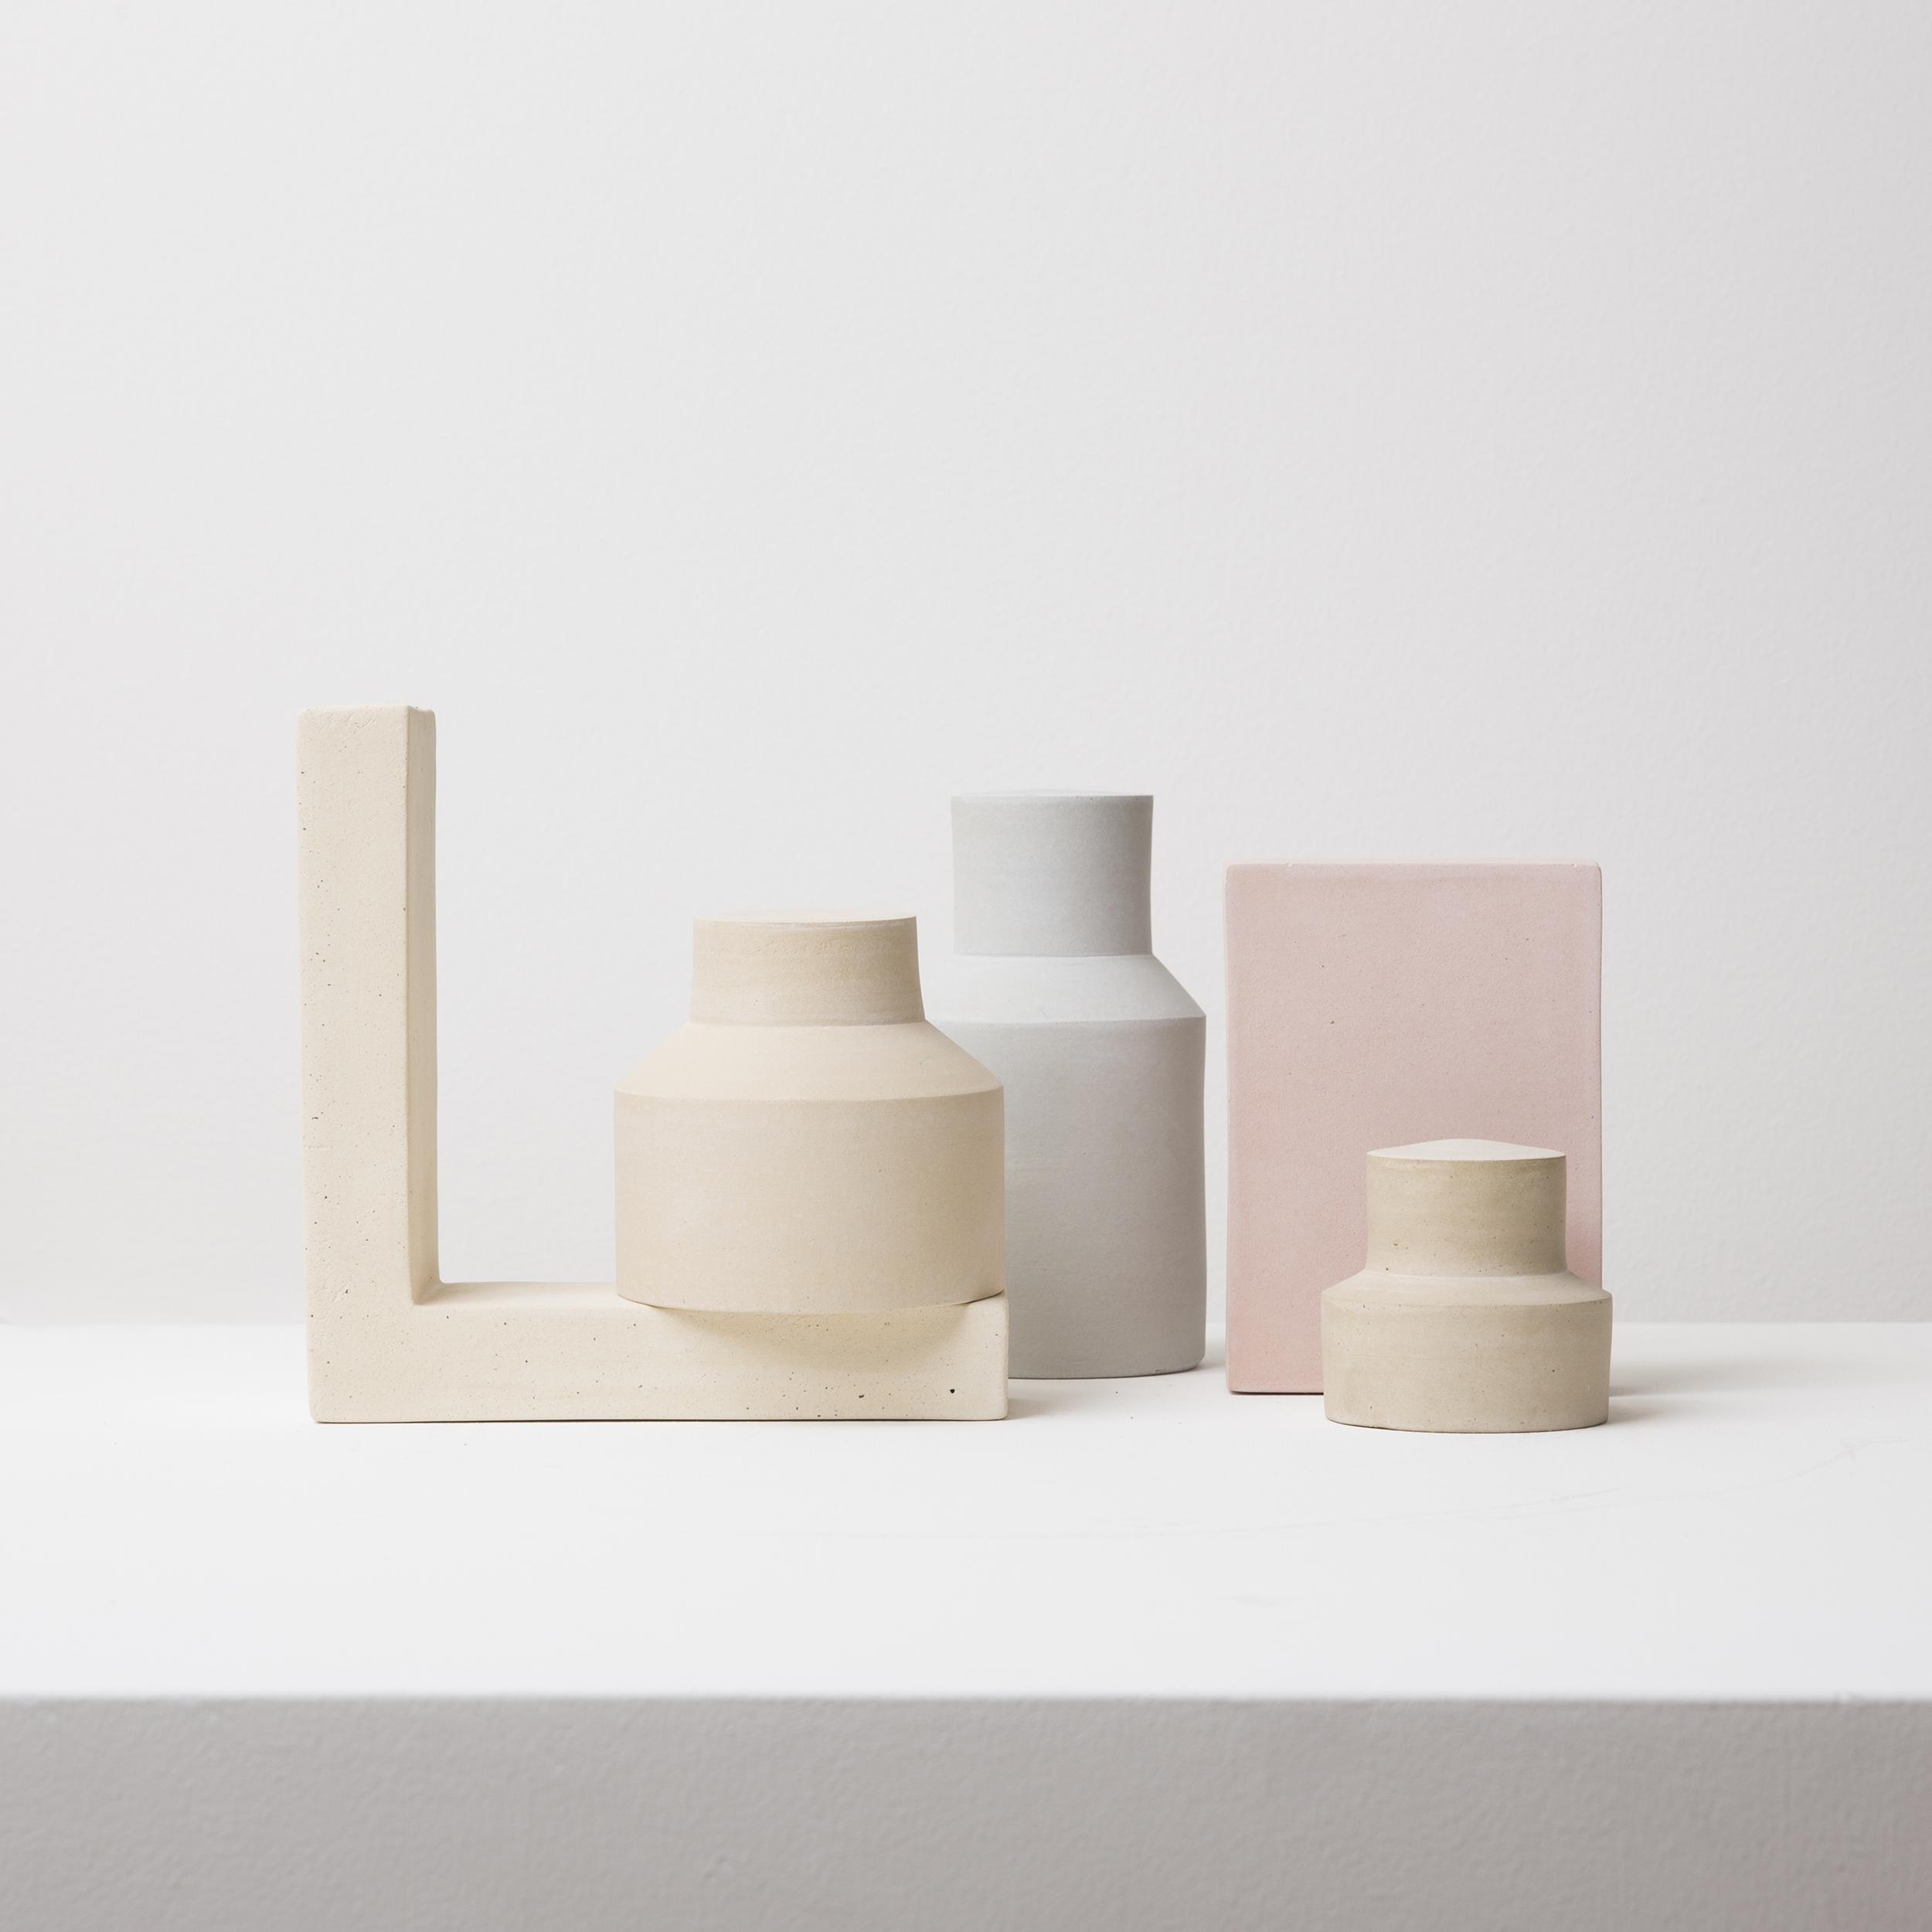 CONSTRUCT – Irina Razumovskaya